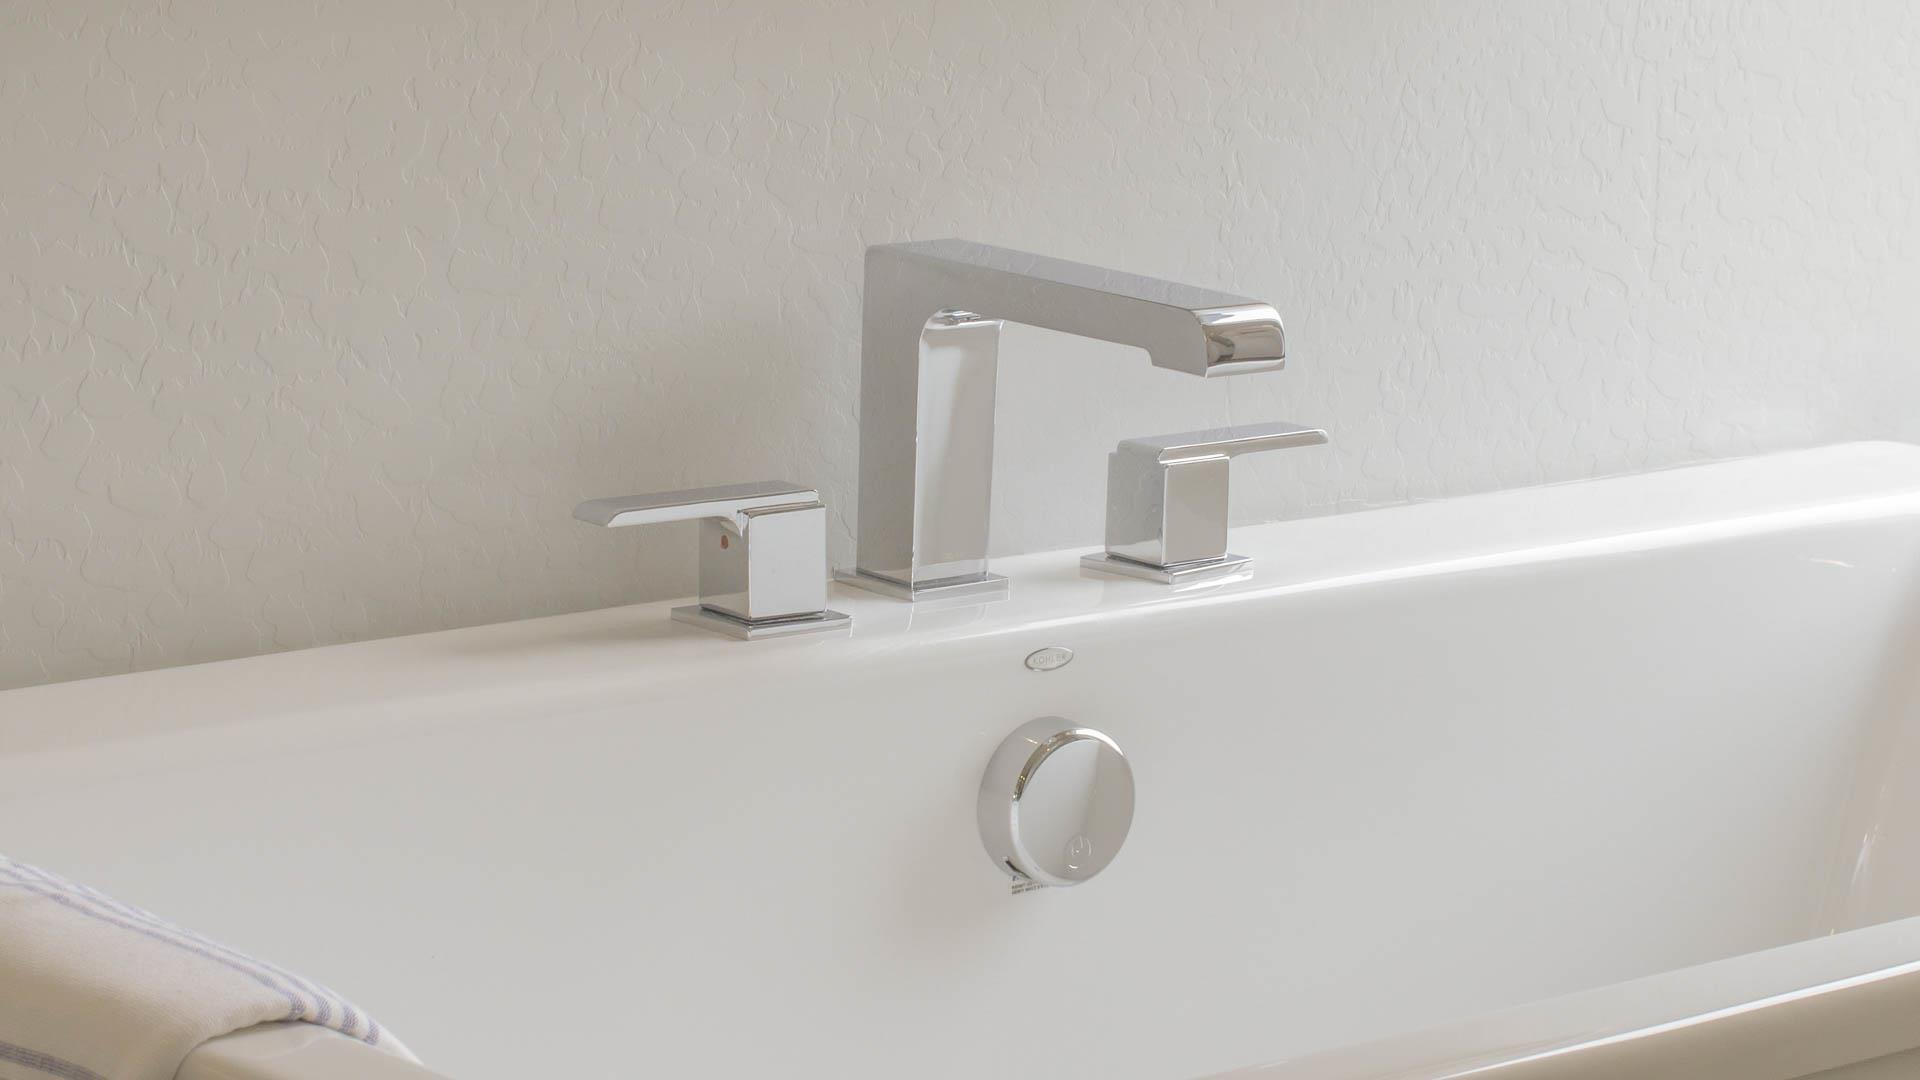 Bathroom featured in the J606 By Mandalay Homes in Prescott, AZ